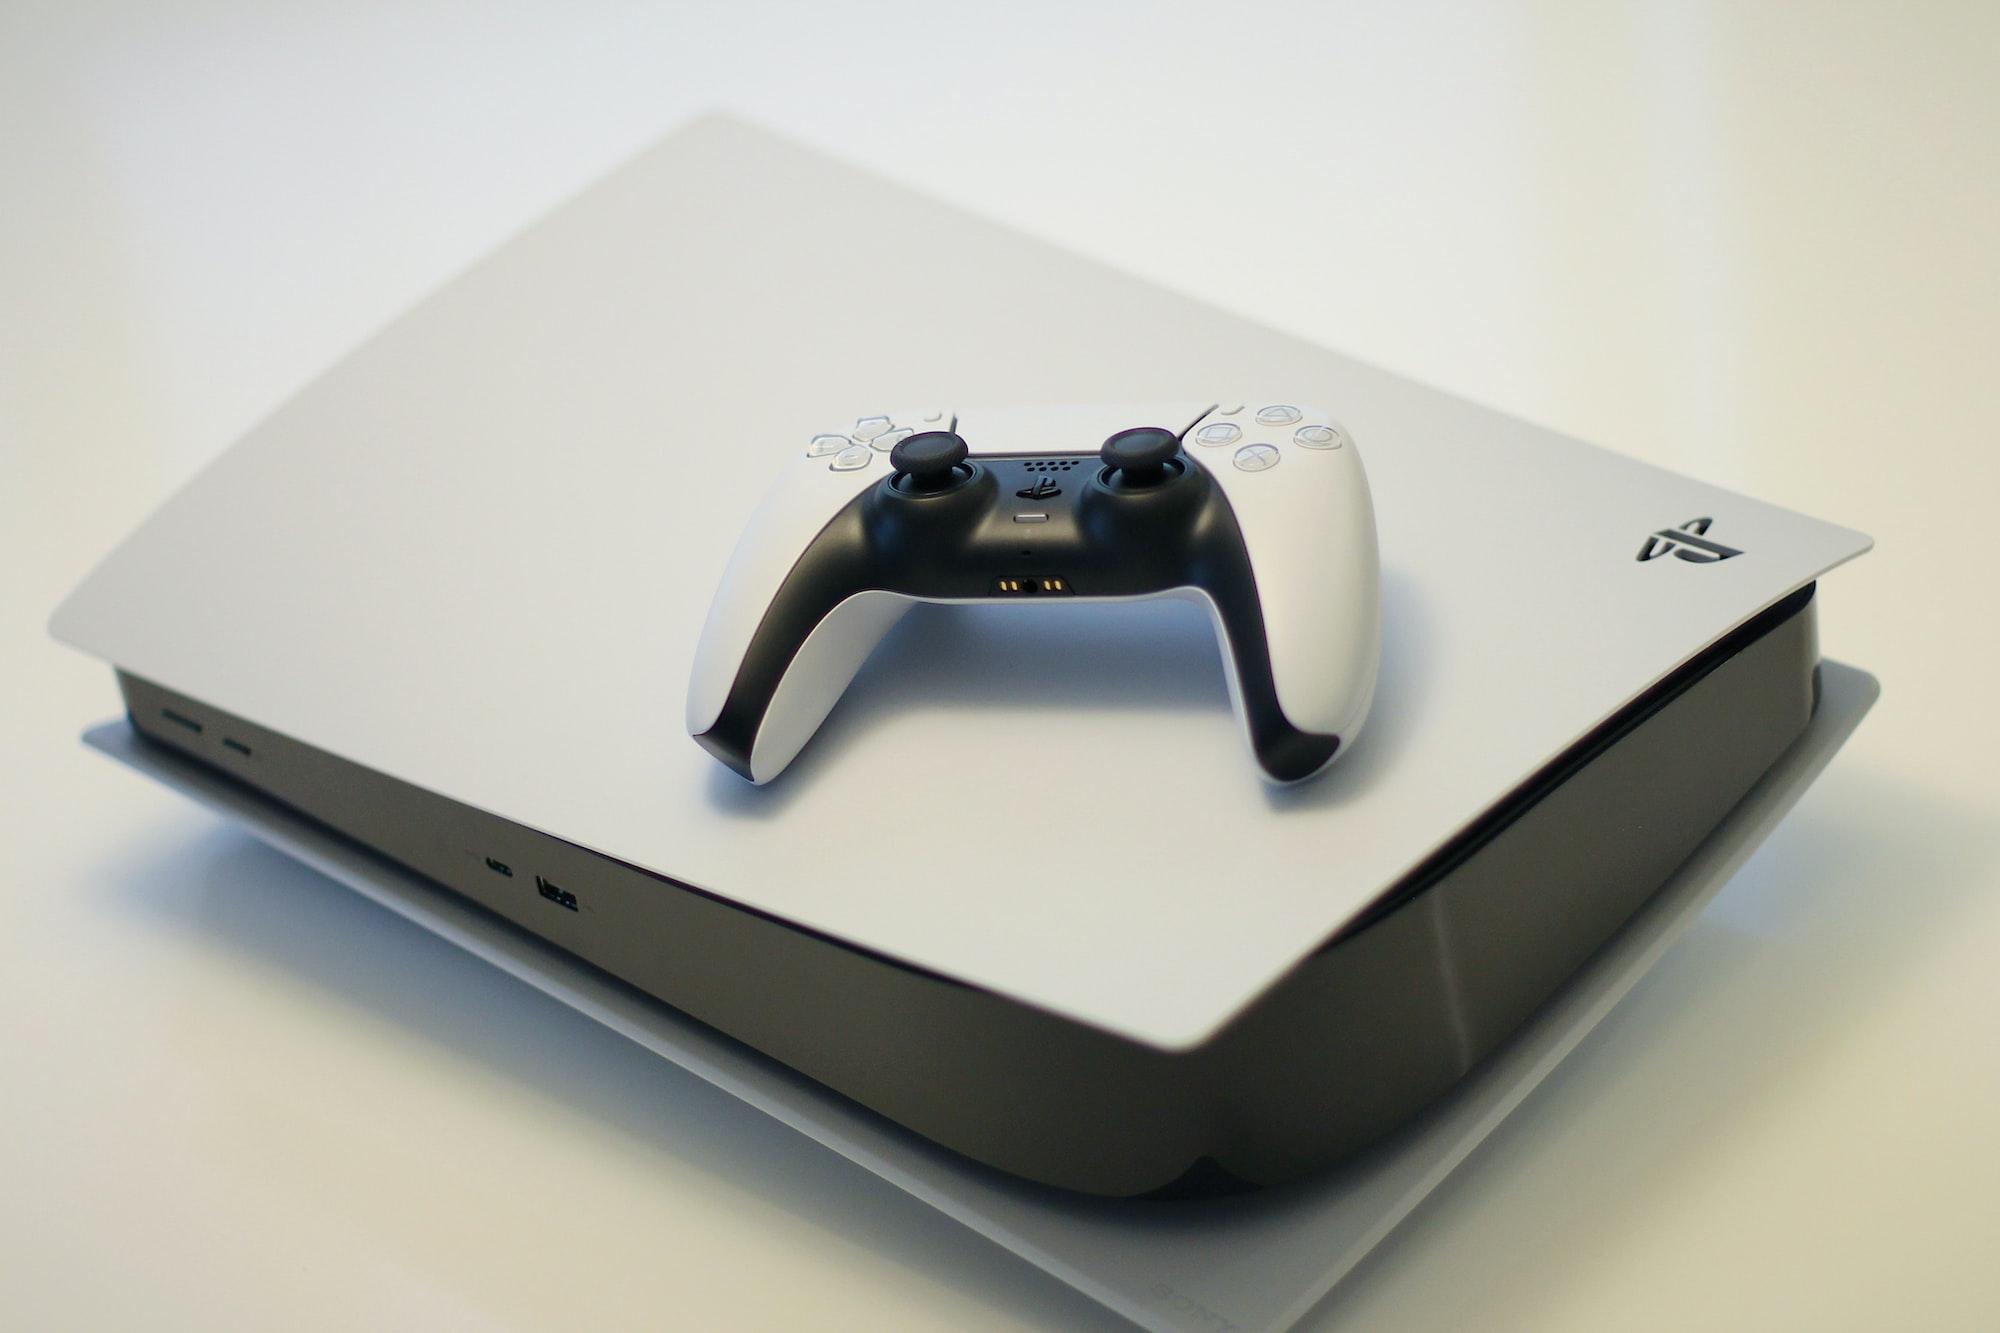 Sony já vendeu 13,4 milhões de PlayStation 5